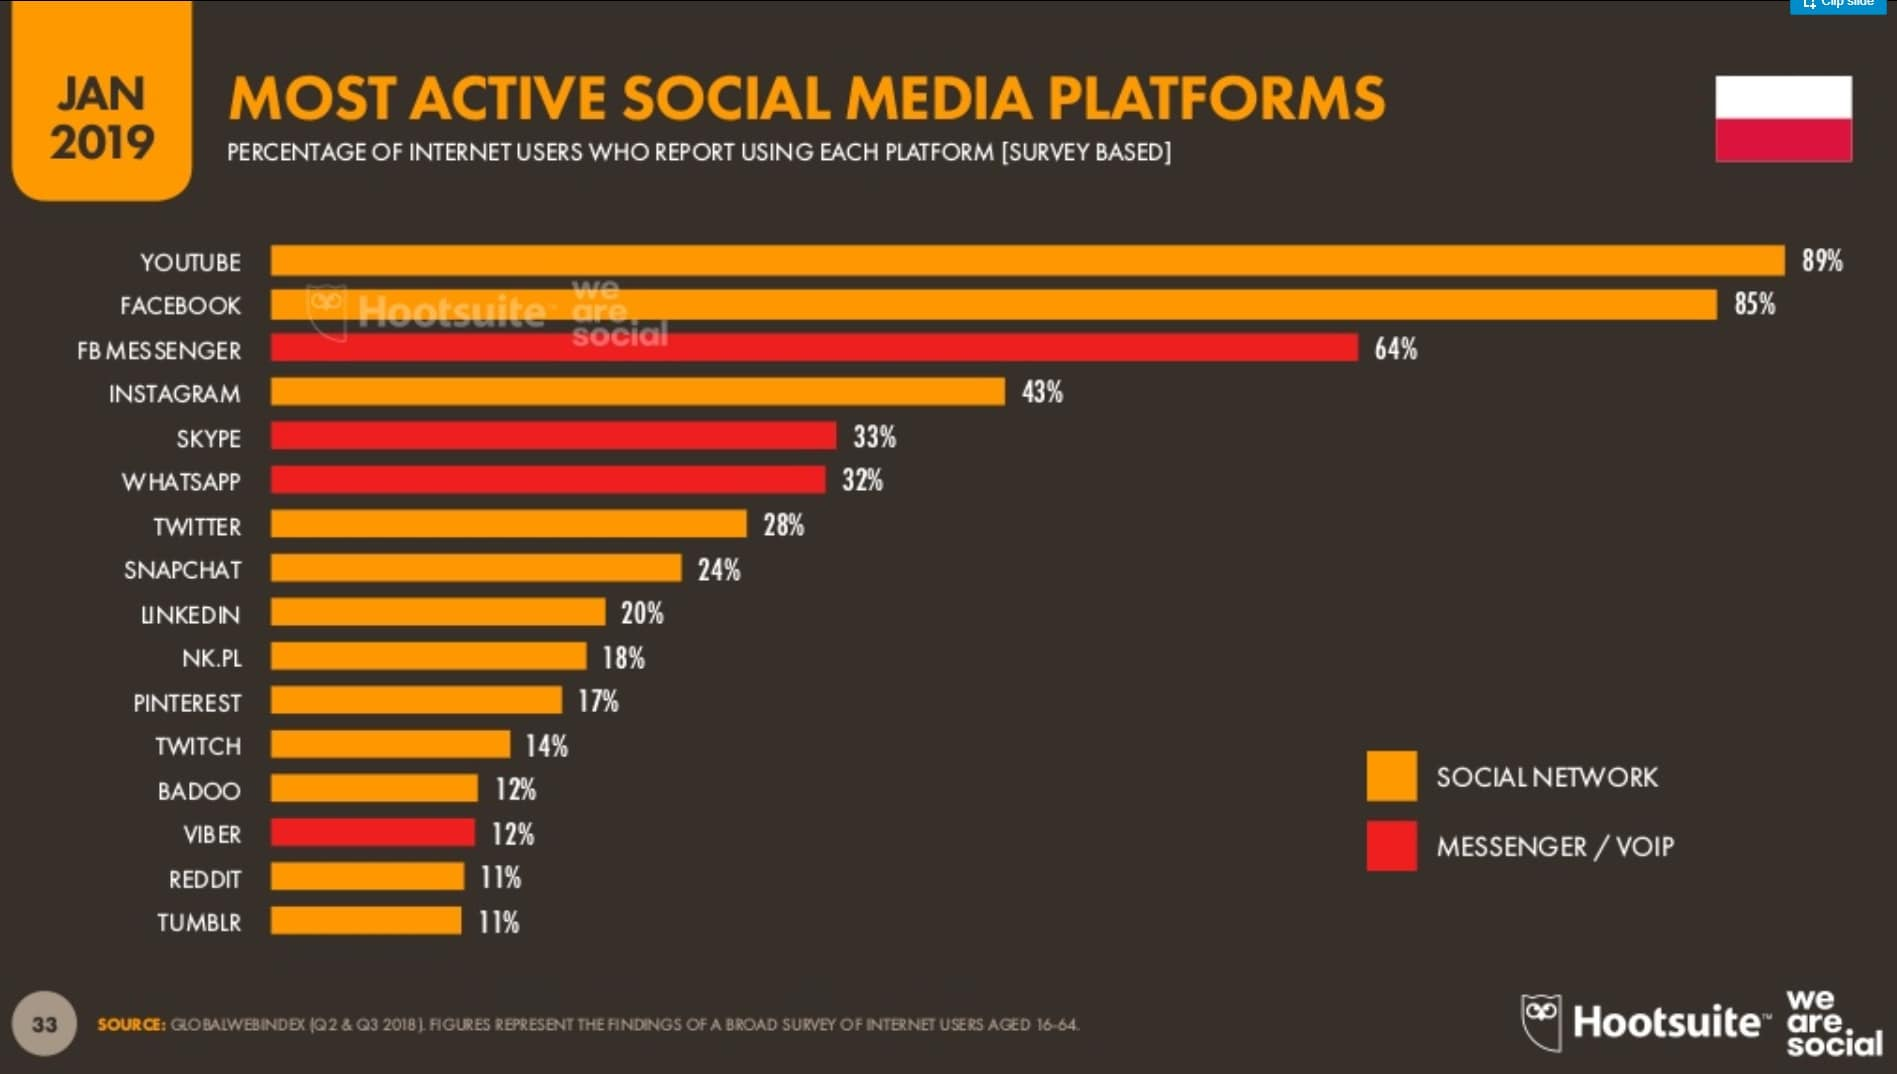 Hootsuite Social Media Rankings